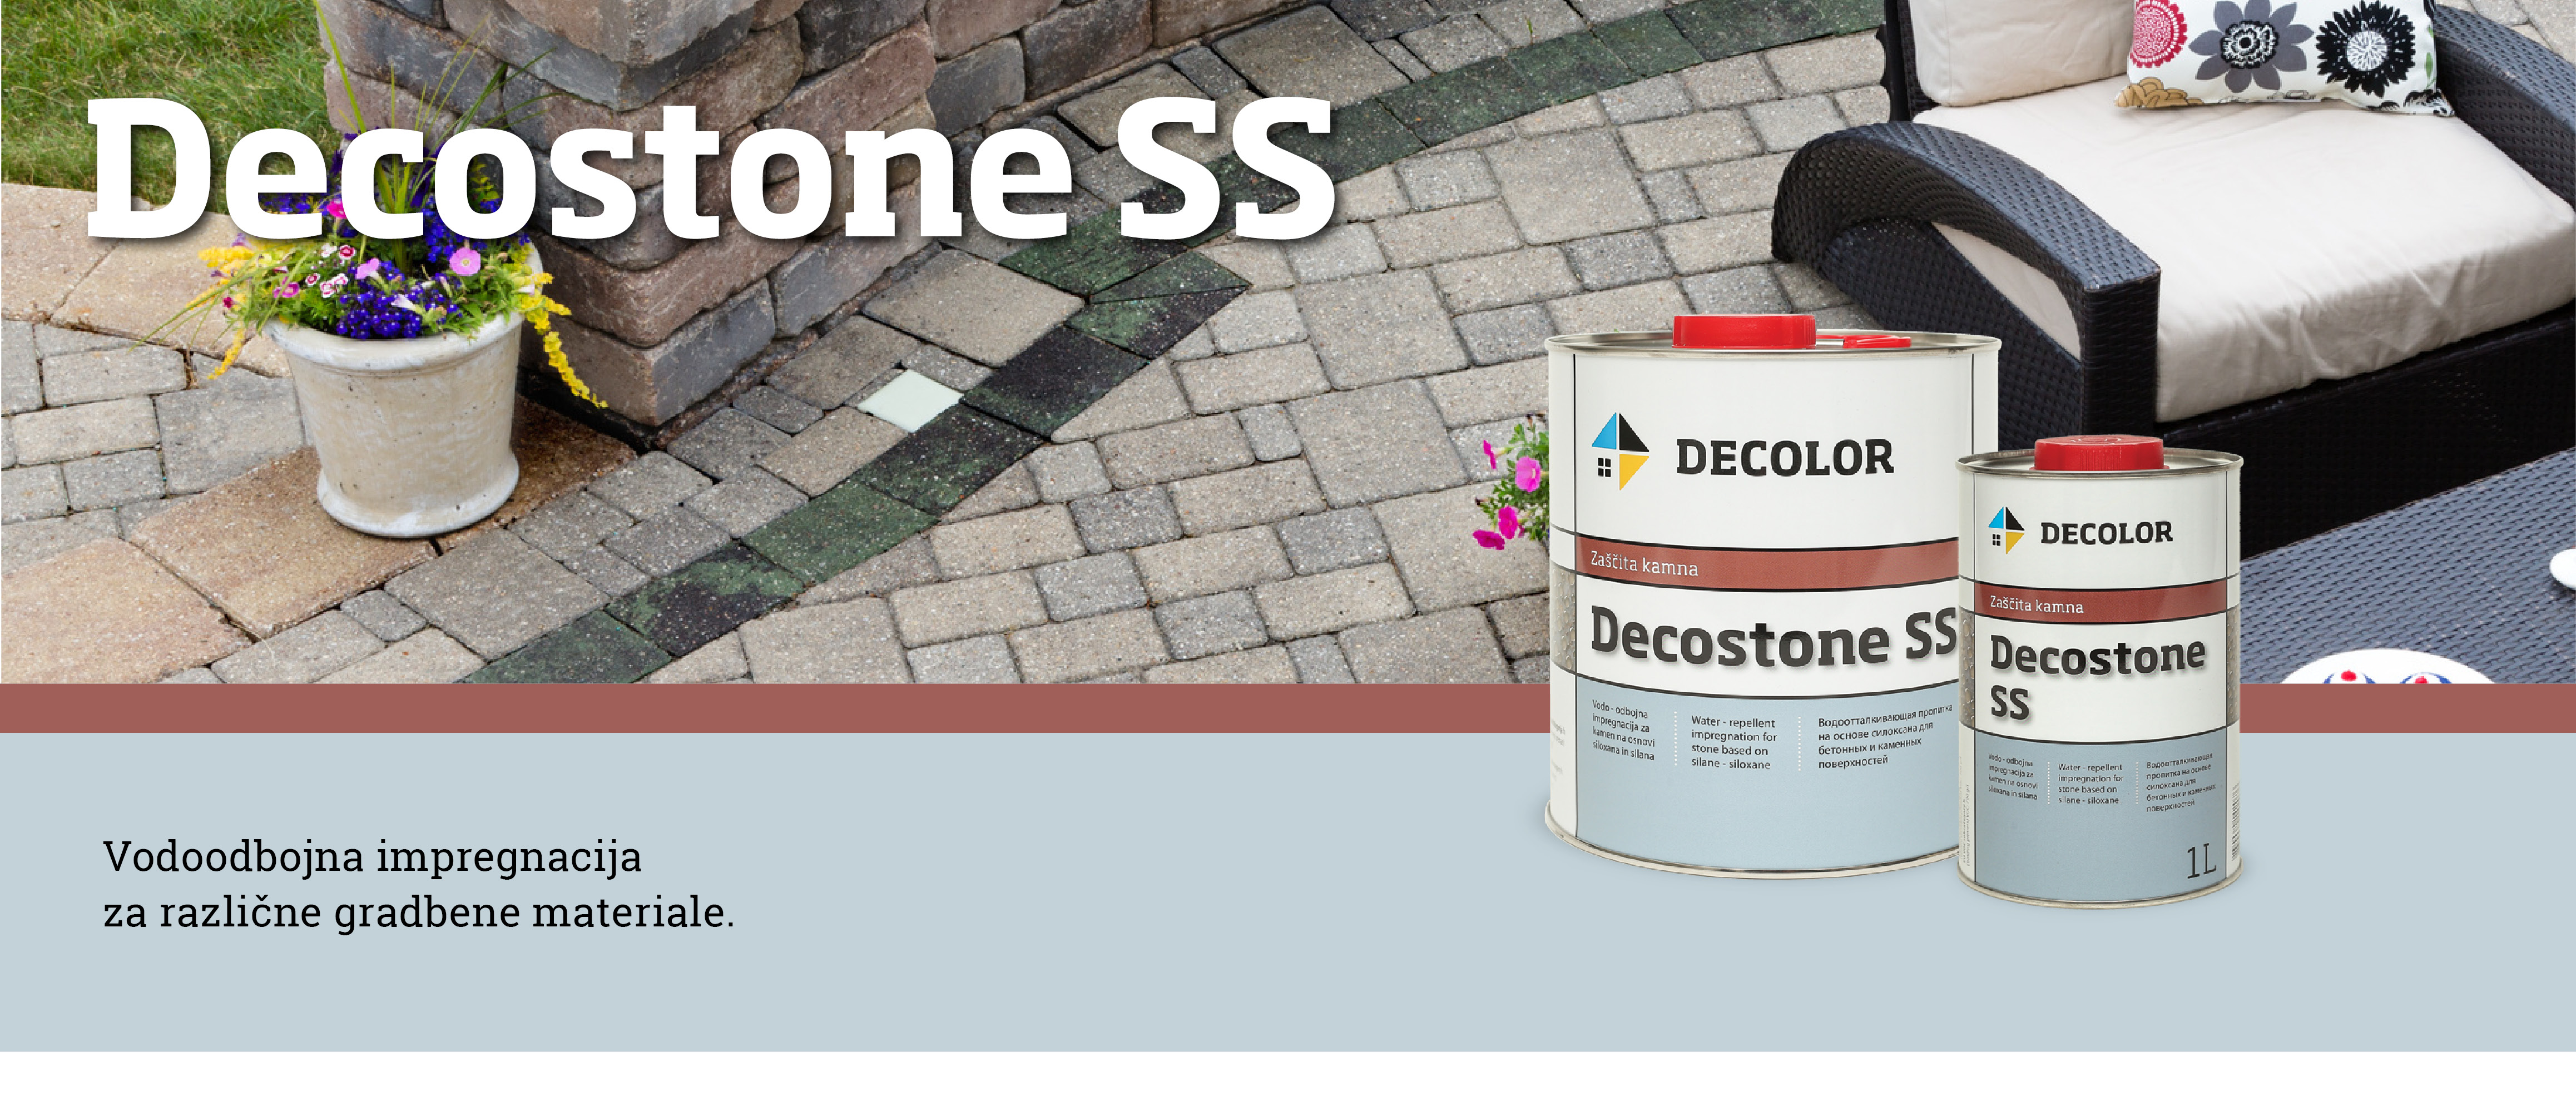 DecostoneSS